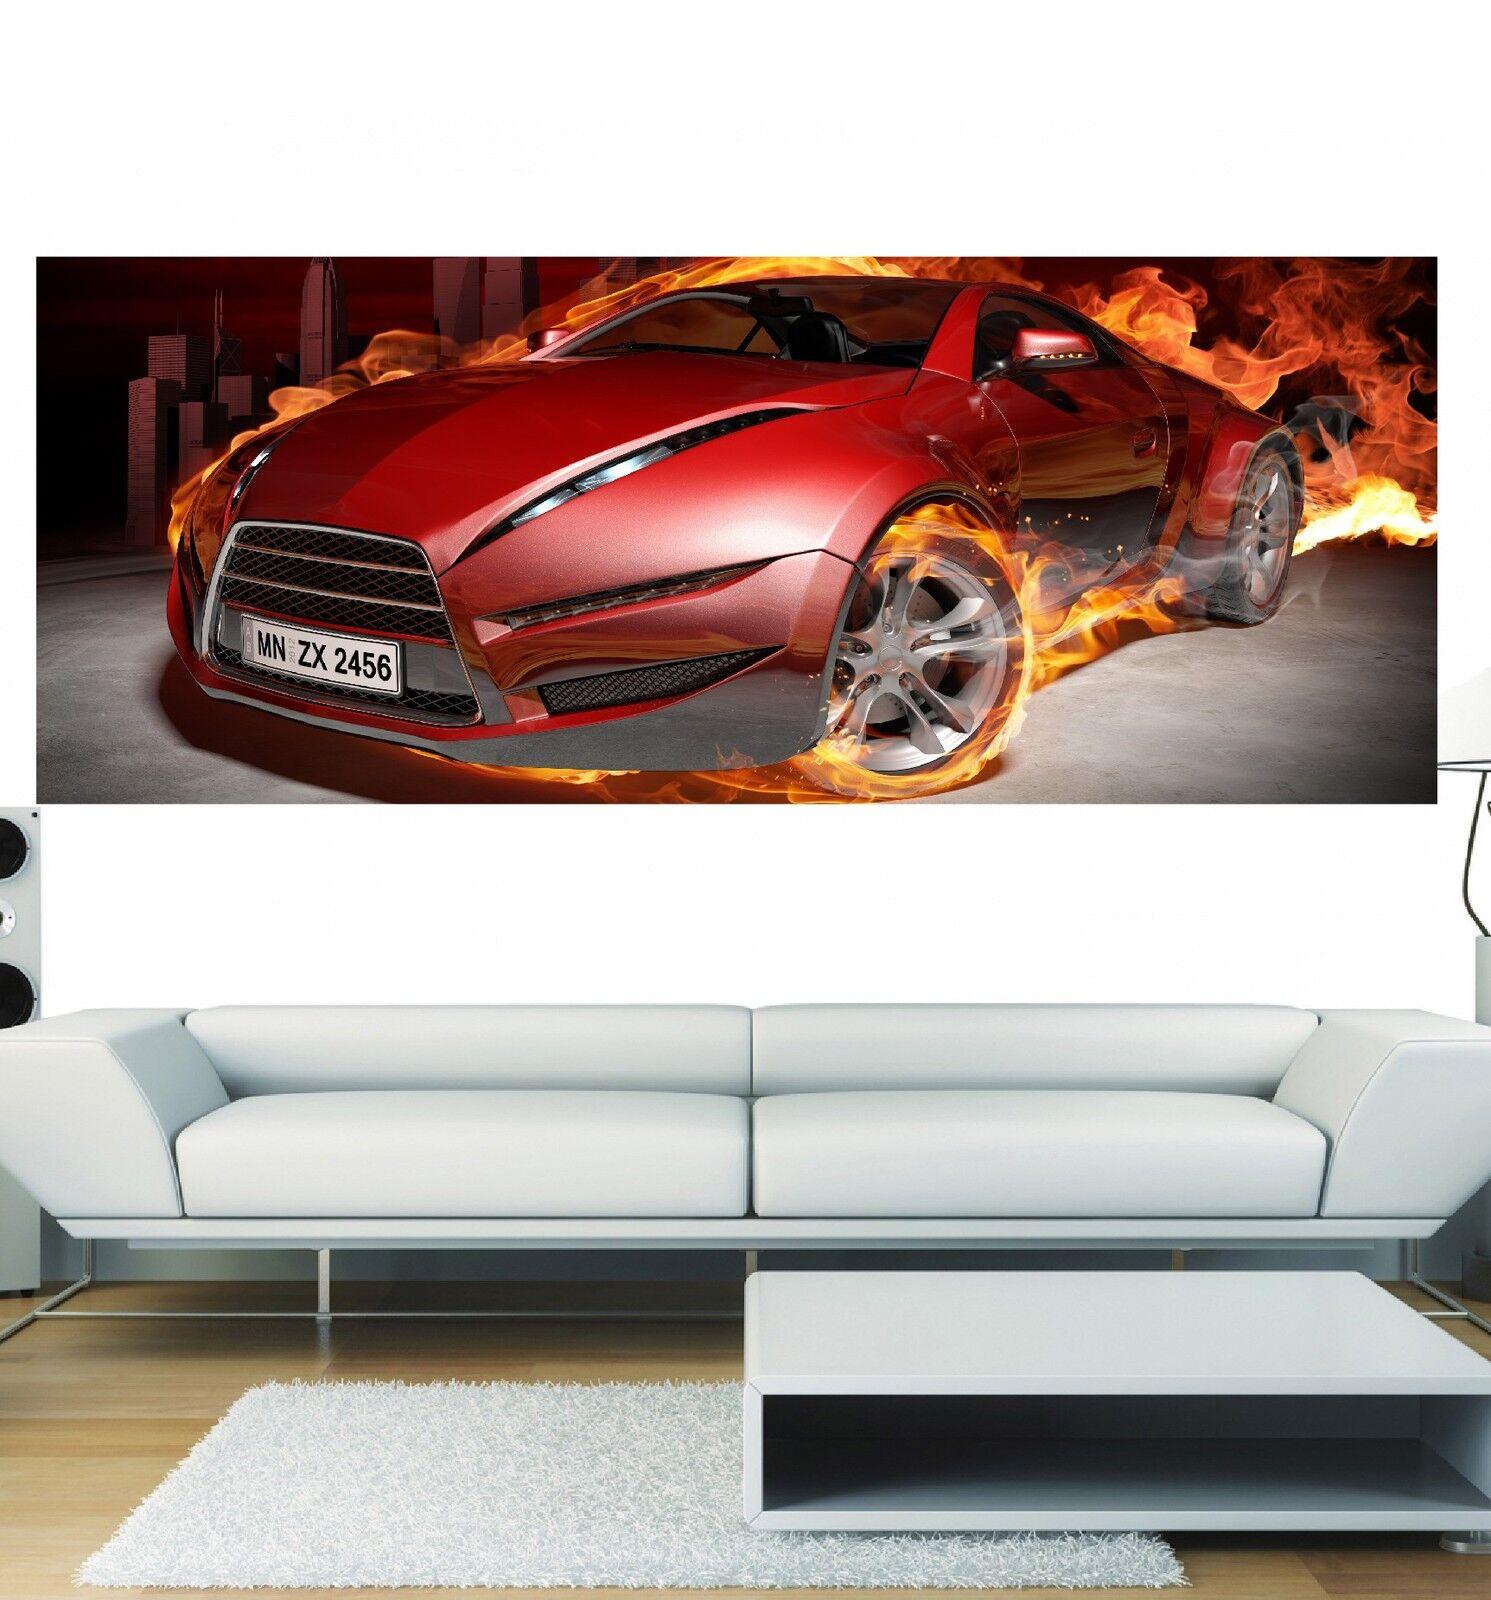 Papel pintado panorámica coche en llamas 3648 Arte decoración Pegatinas